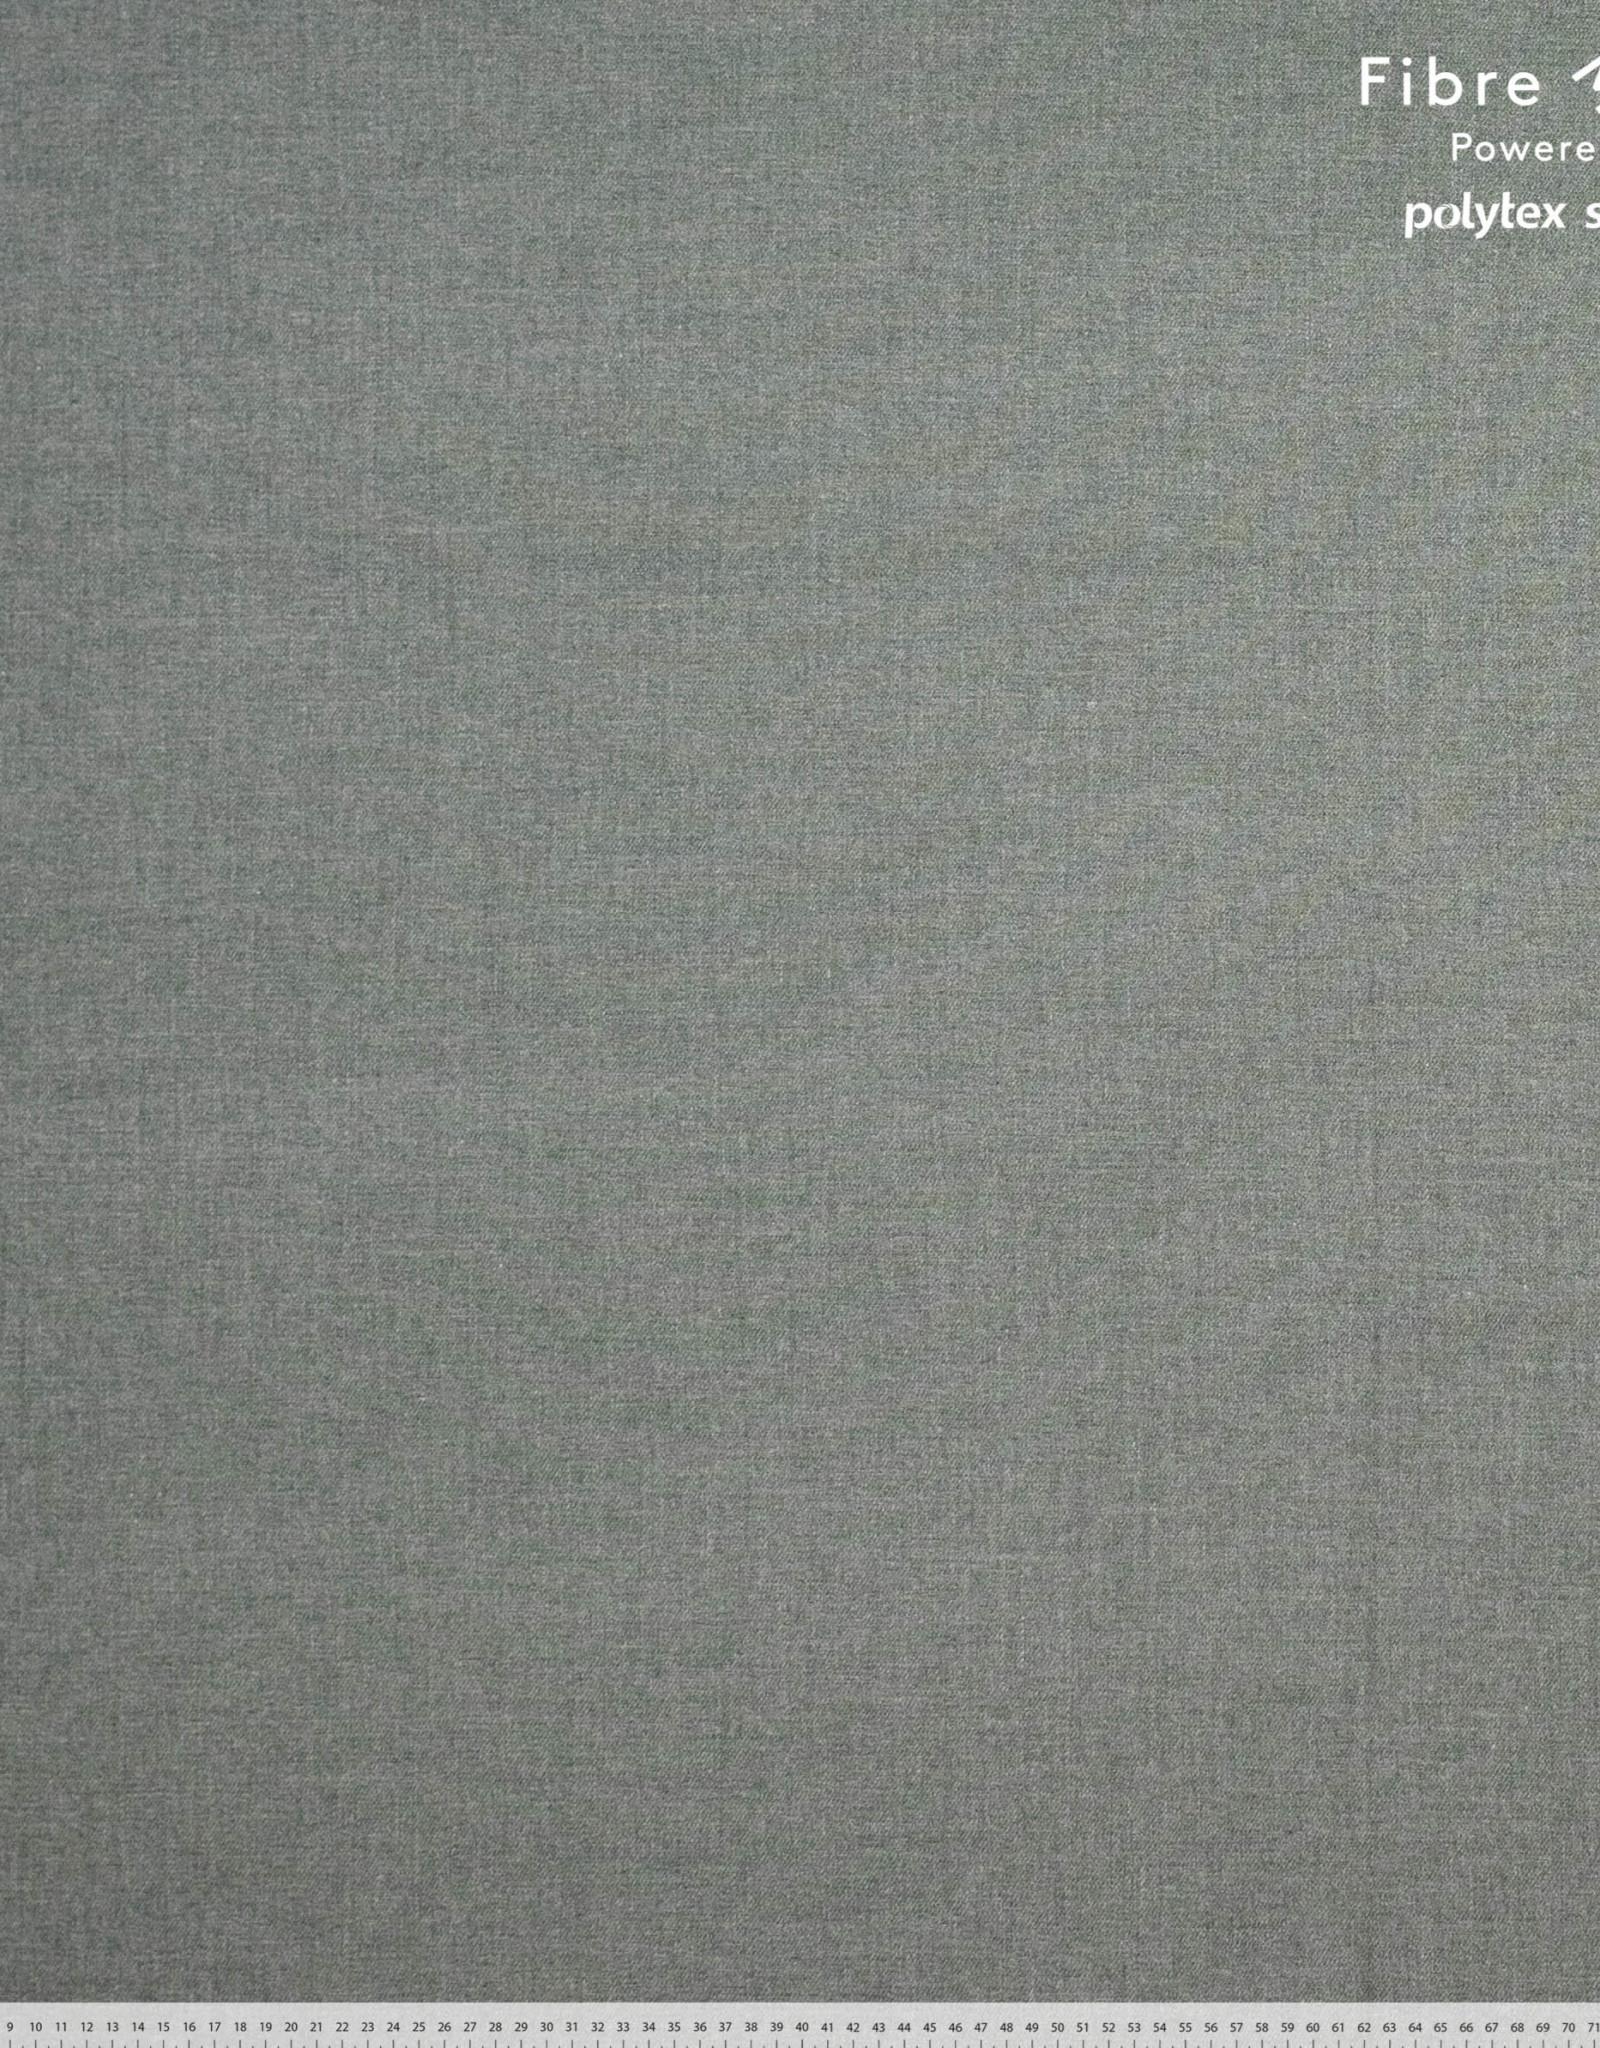 Fibre Mood Fibre Mood editie14 Woven bamboo/gerycleerd polyester Oud Groen Noelle